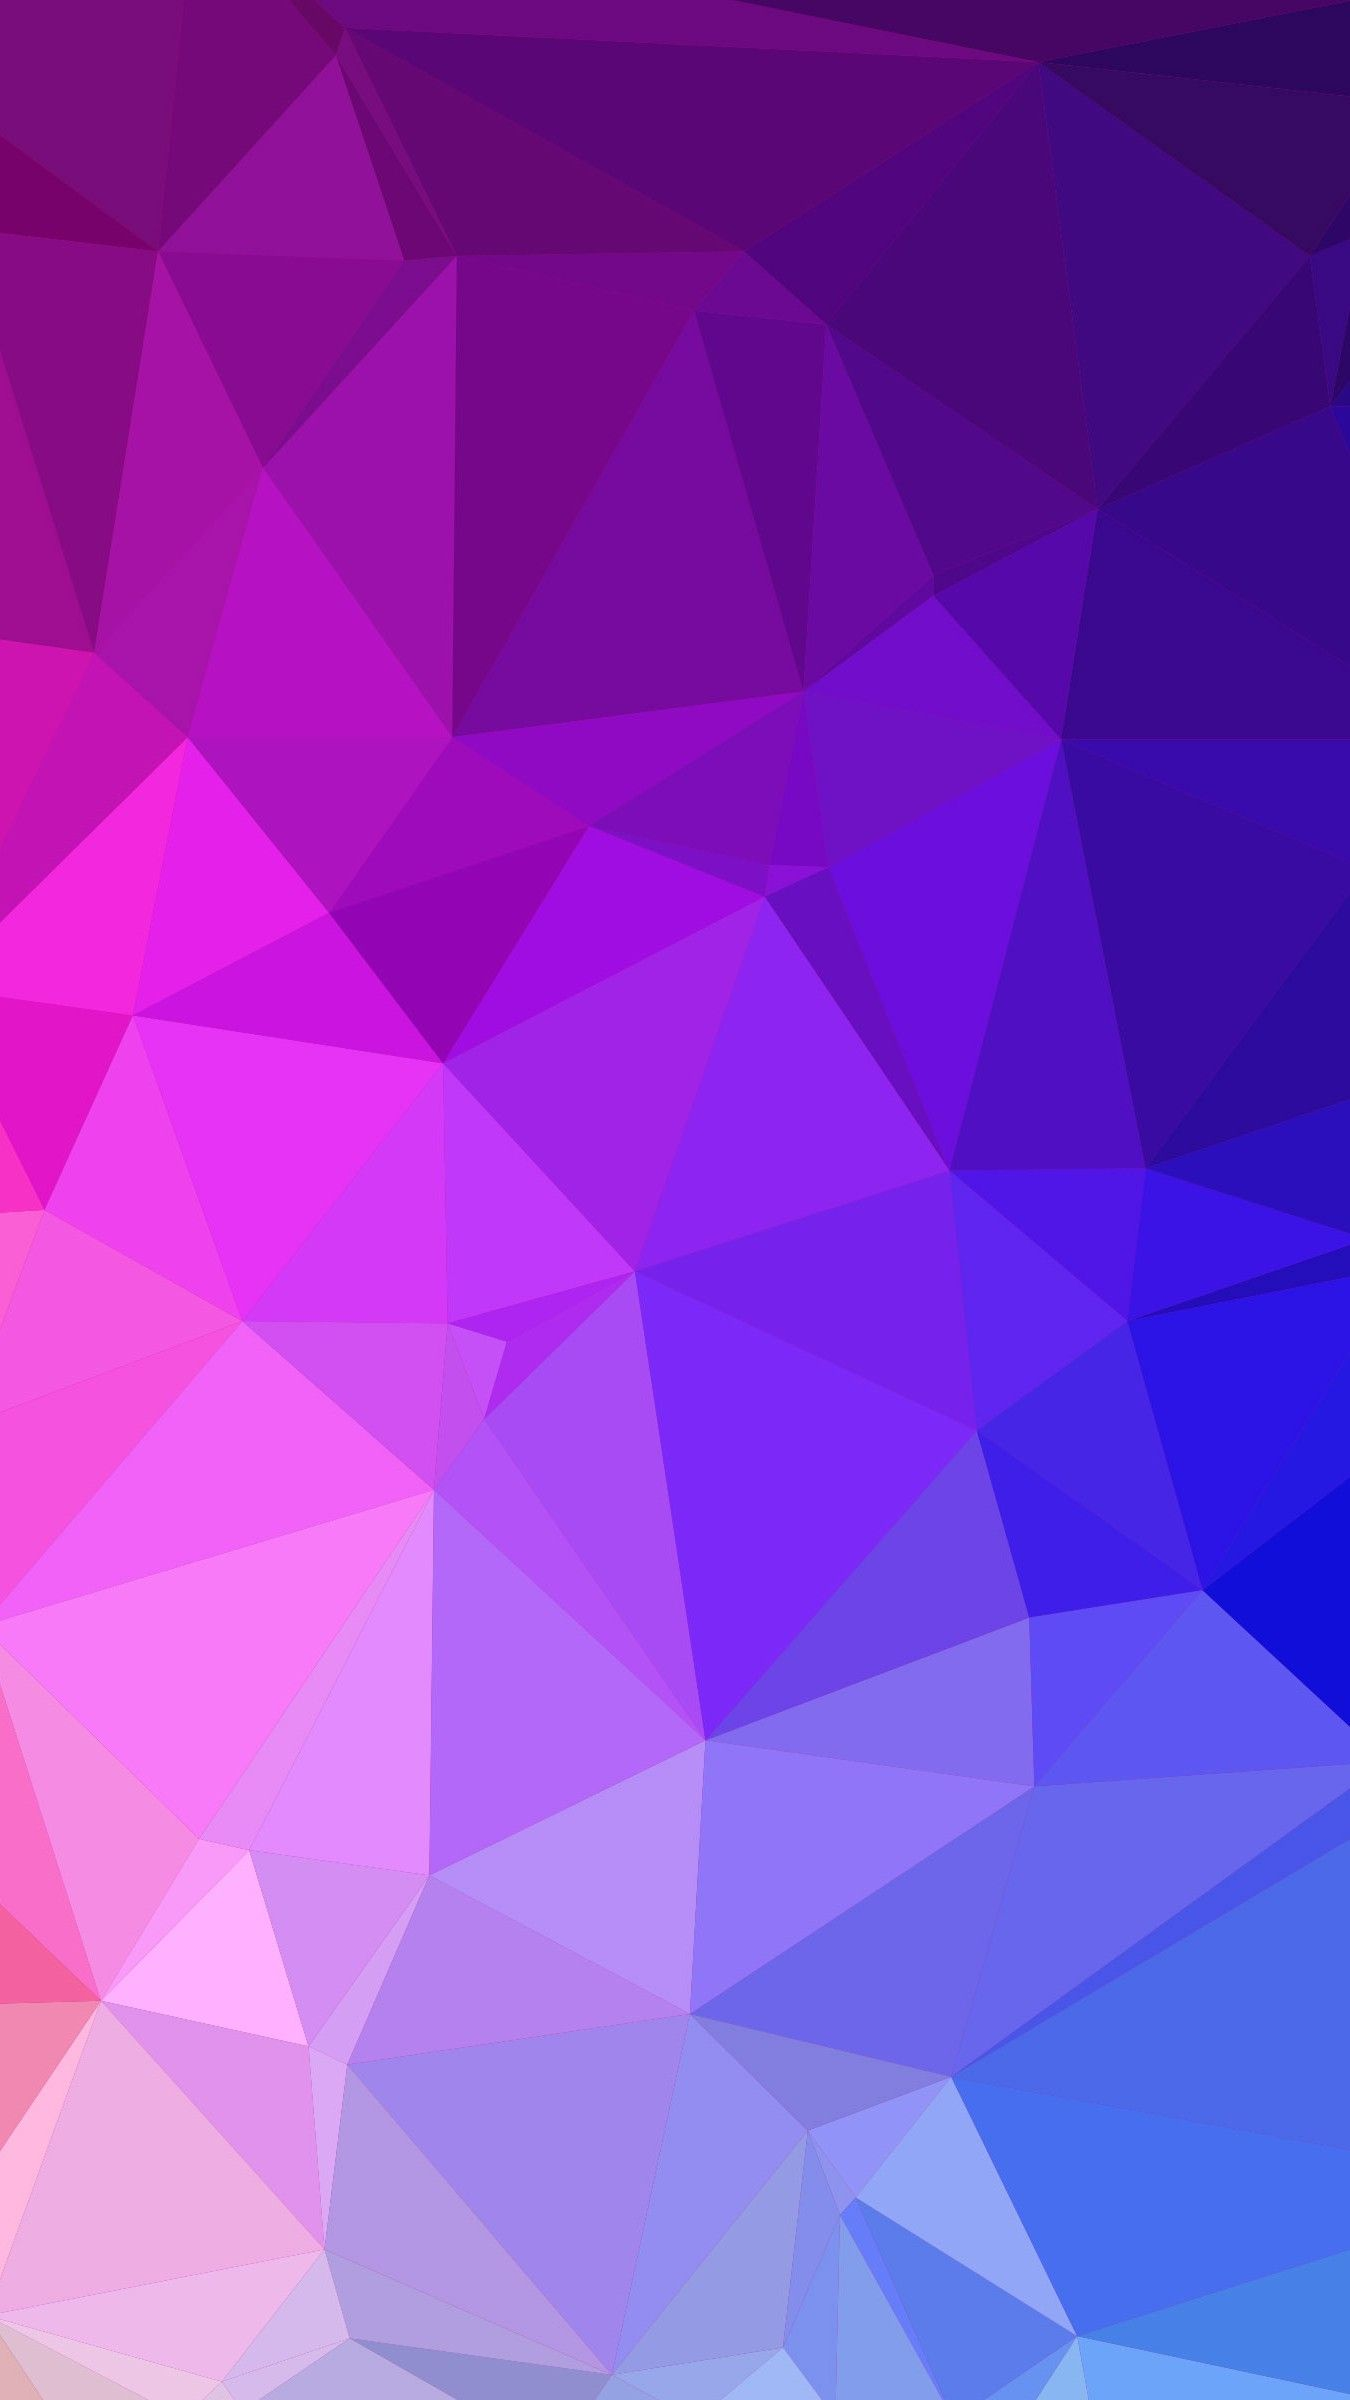 iPhone Wallpaper Violet Purple Blue Pattern Magenta Design 1350x2400